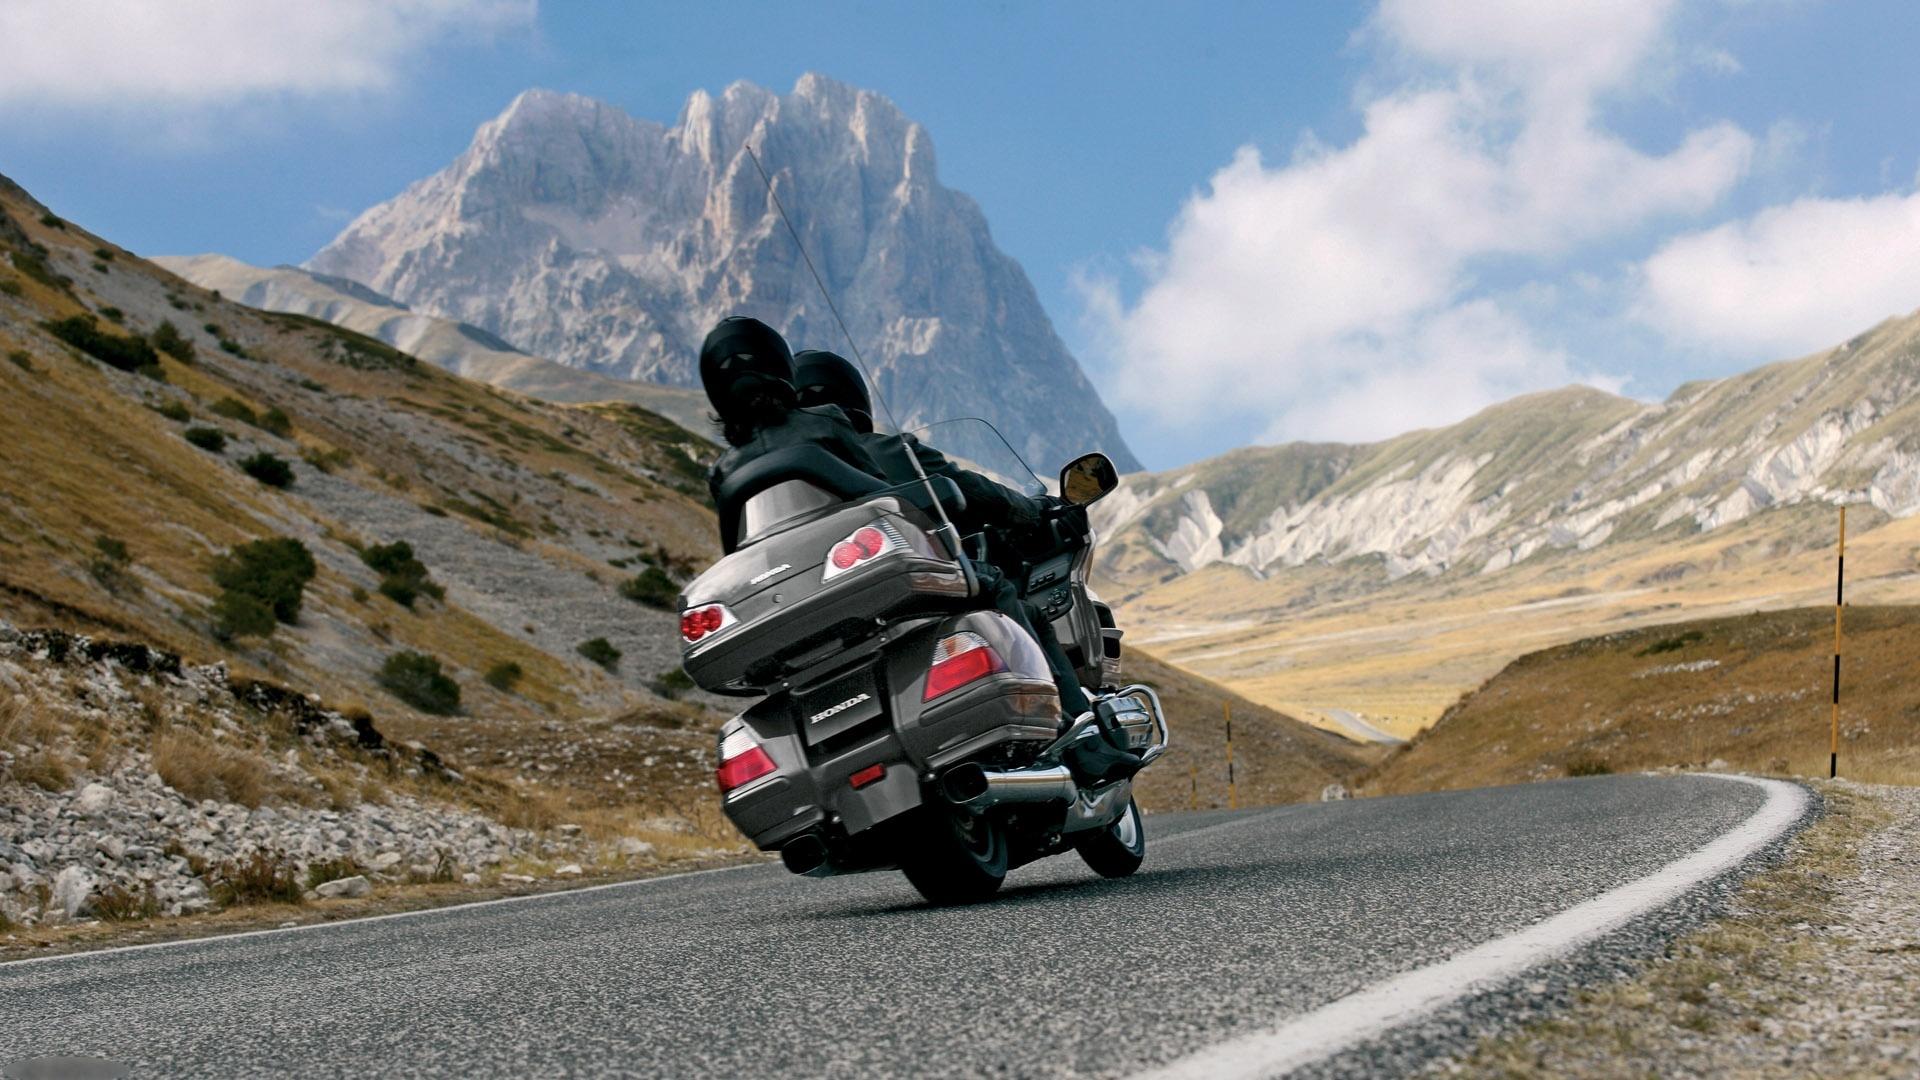 мотоцикл от первого лица дорога  № 16442 без смс